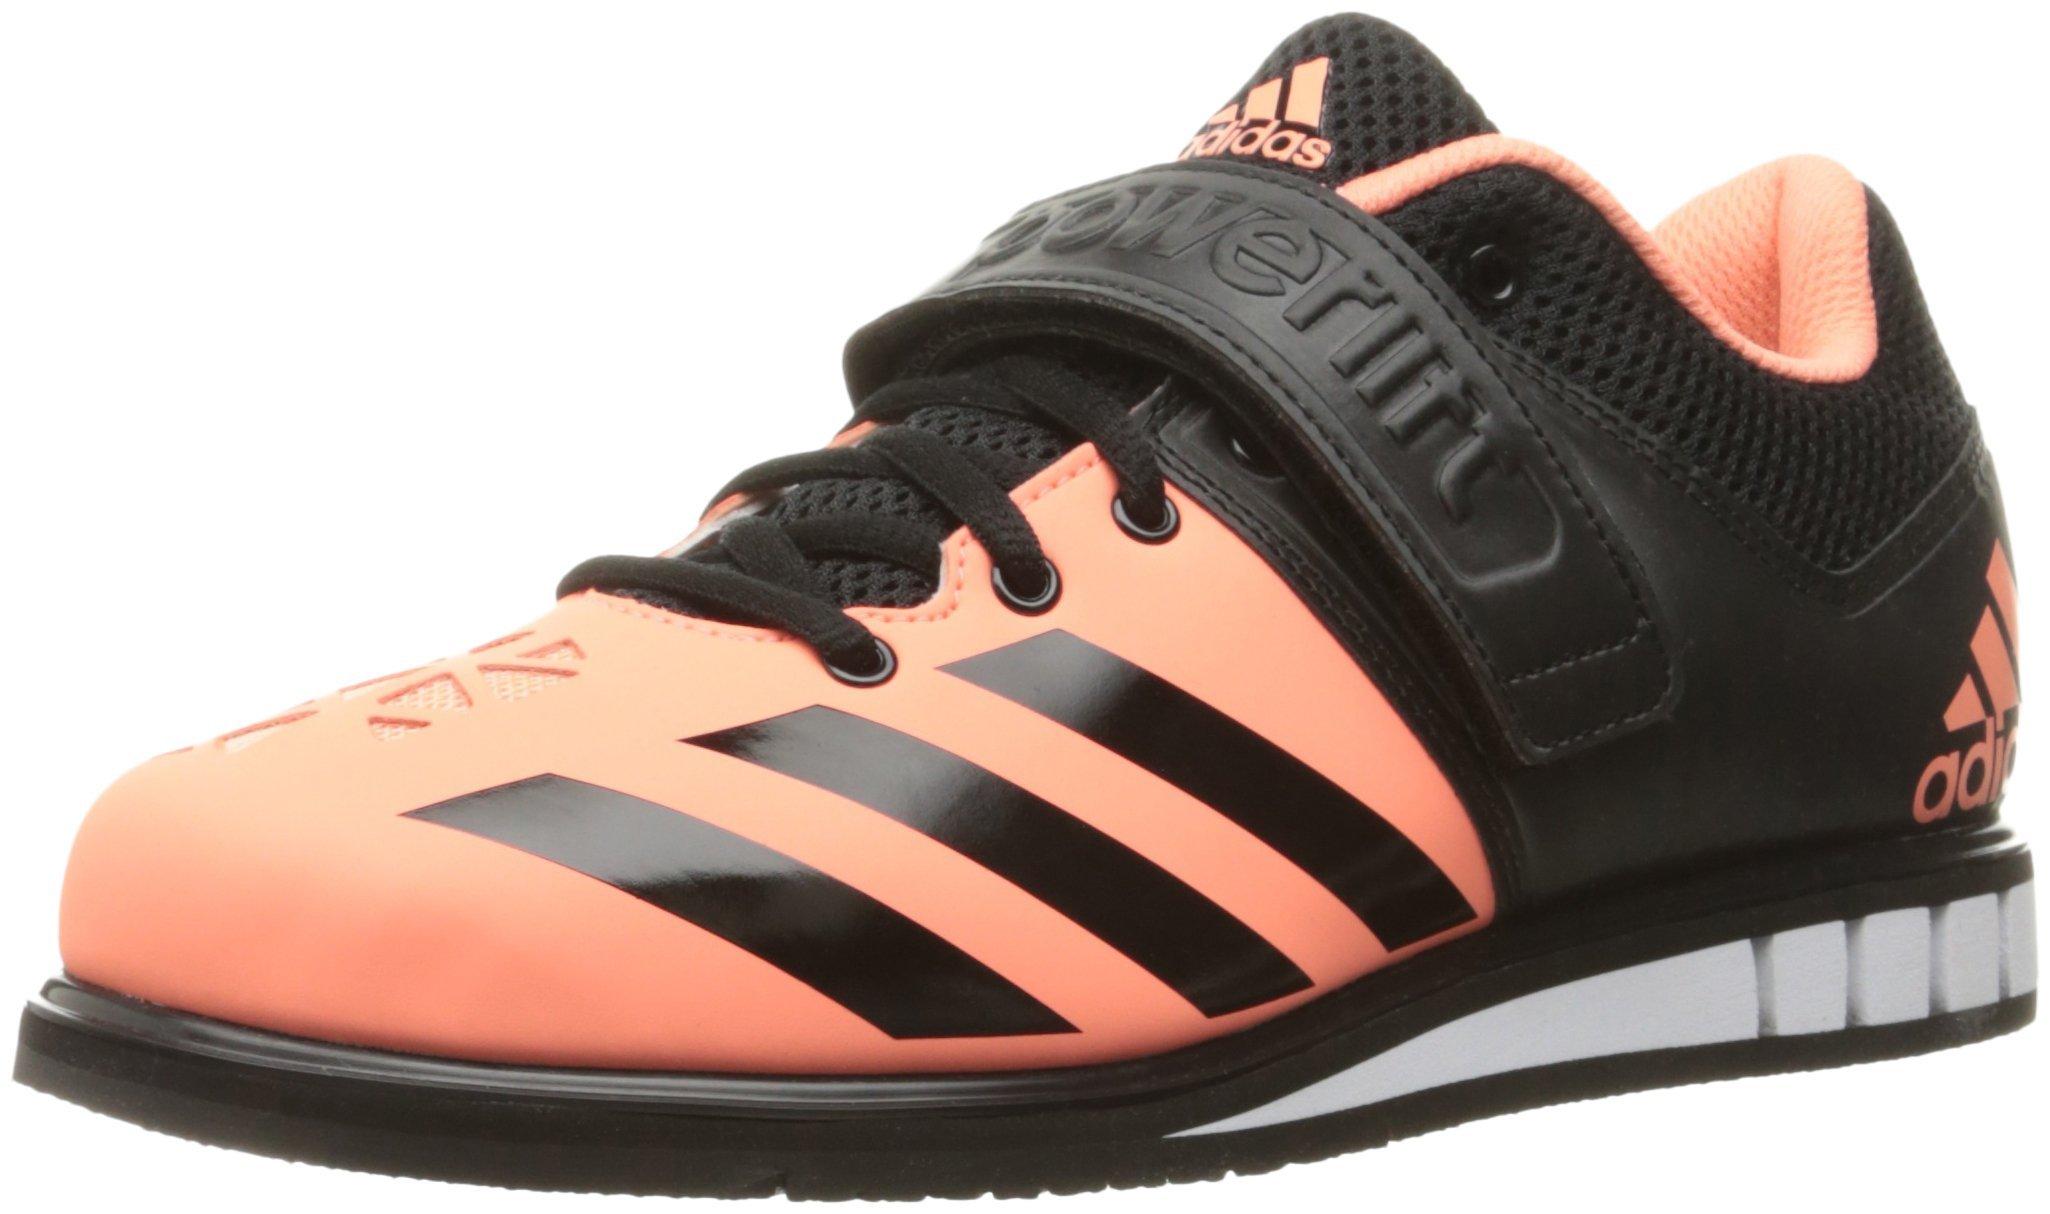 adidas Women's Shoes Powerlift.3 Cross-Trainer, Sun Glow Black/White, (7 M US)